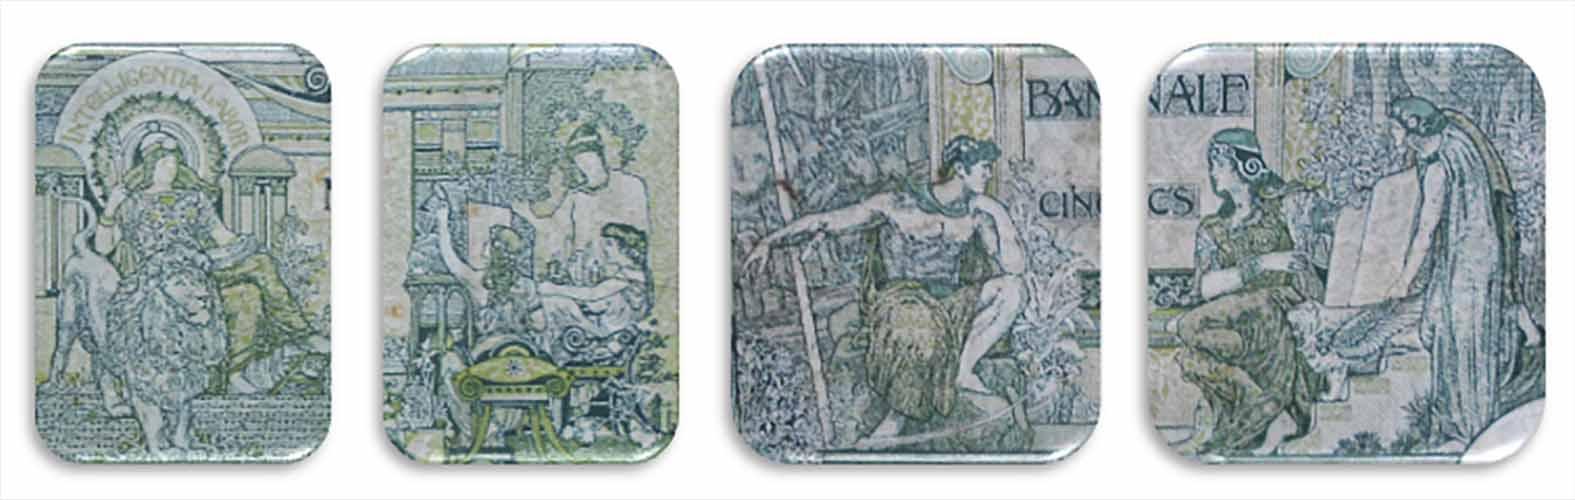 Bélgica 50 francos 1919 alegorias clásicas anverso y reverso